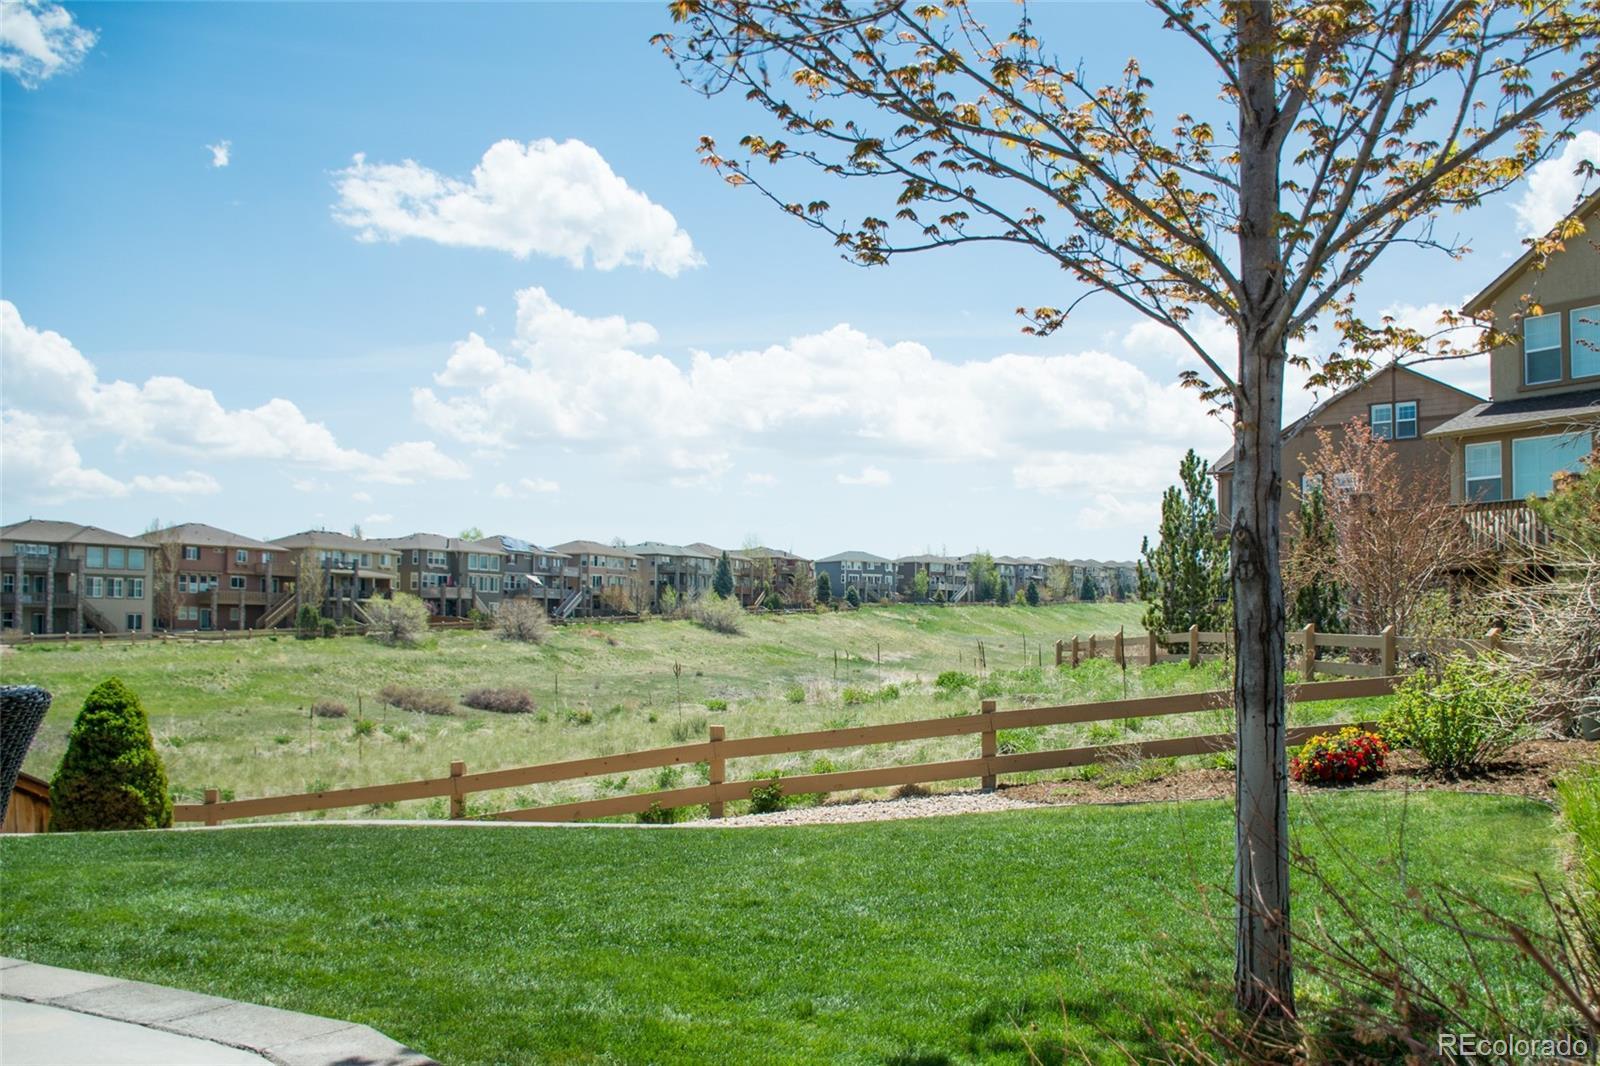 MLS# 6747511 - 2 - 4568 Valleybrook Drive, Highlands Ranch, CO 80130